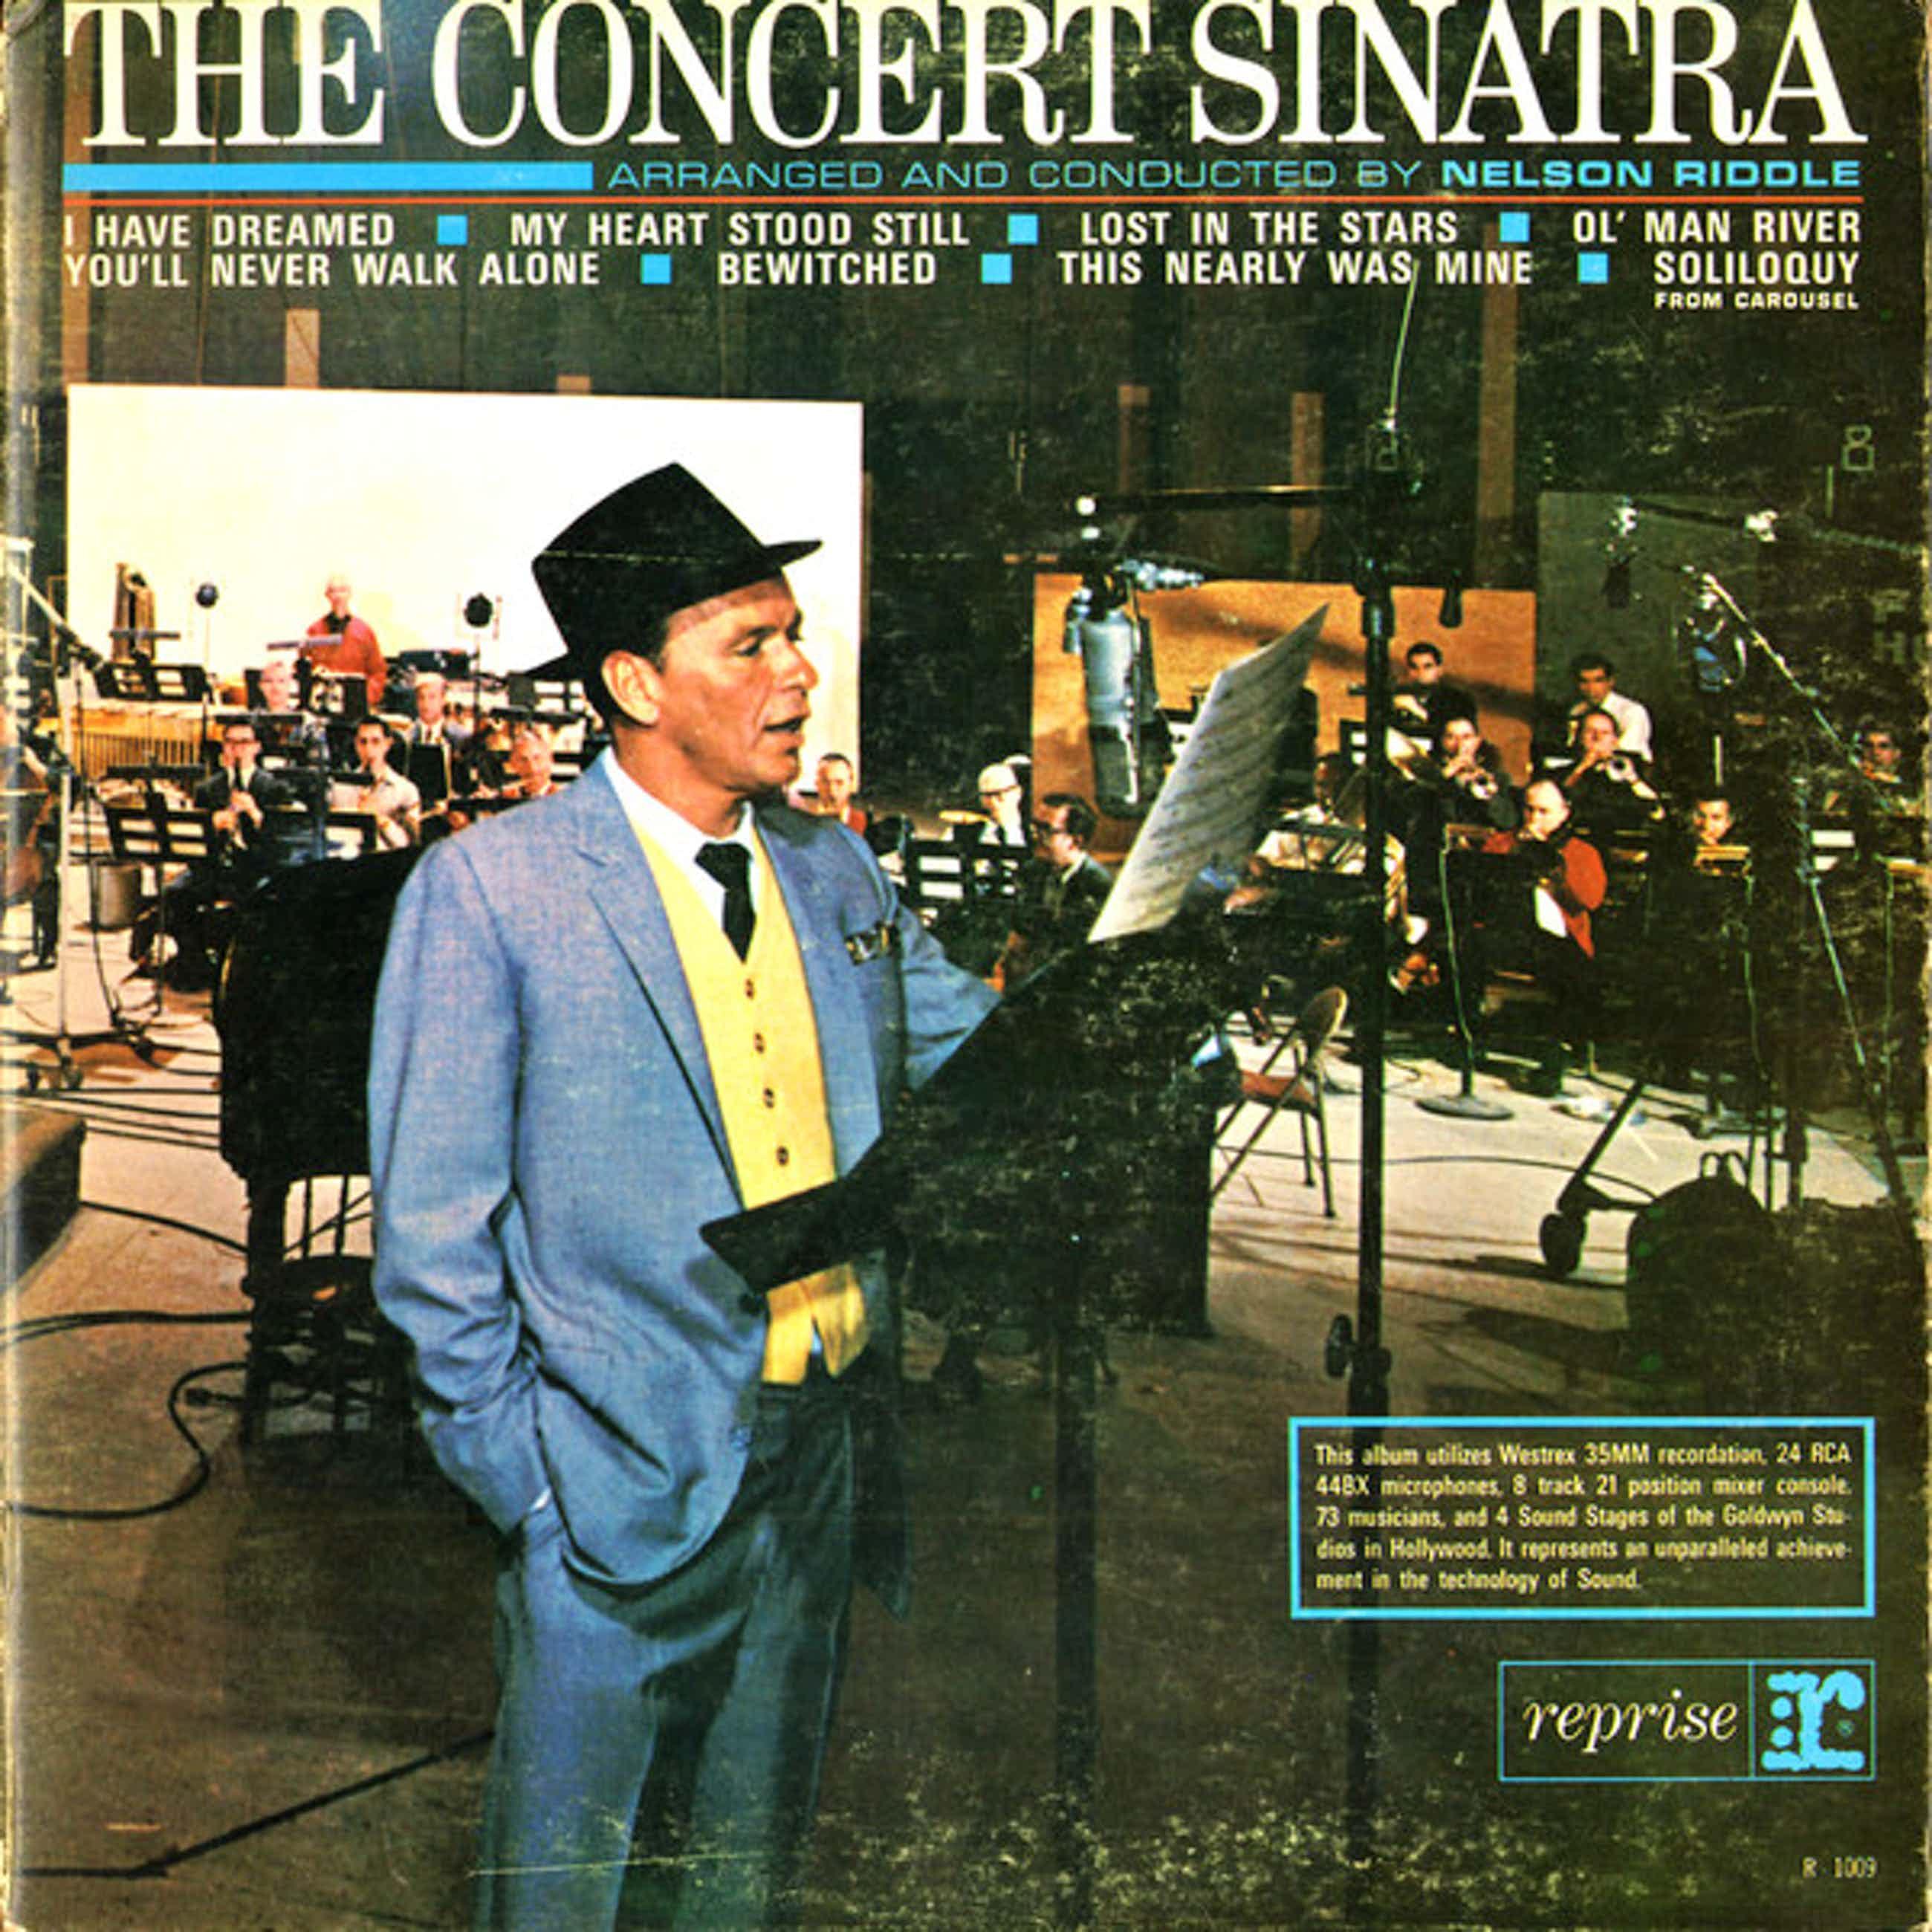 Frank Sinatra - The Concert Sinatra kopen? Bied vanaf 1!